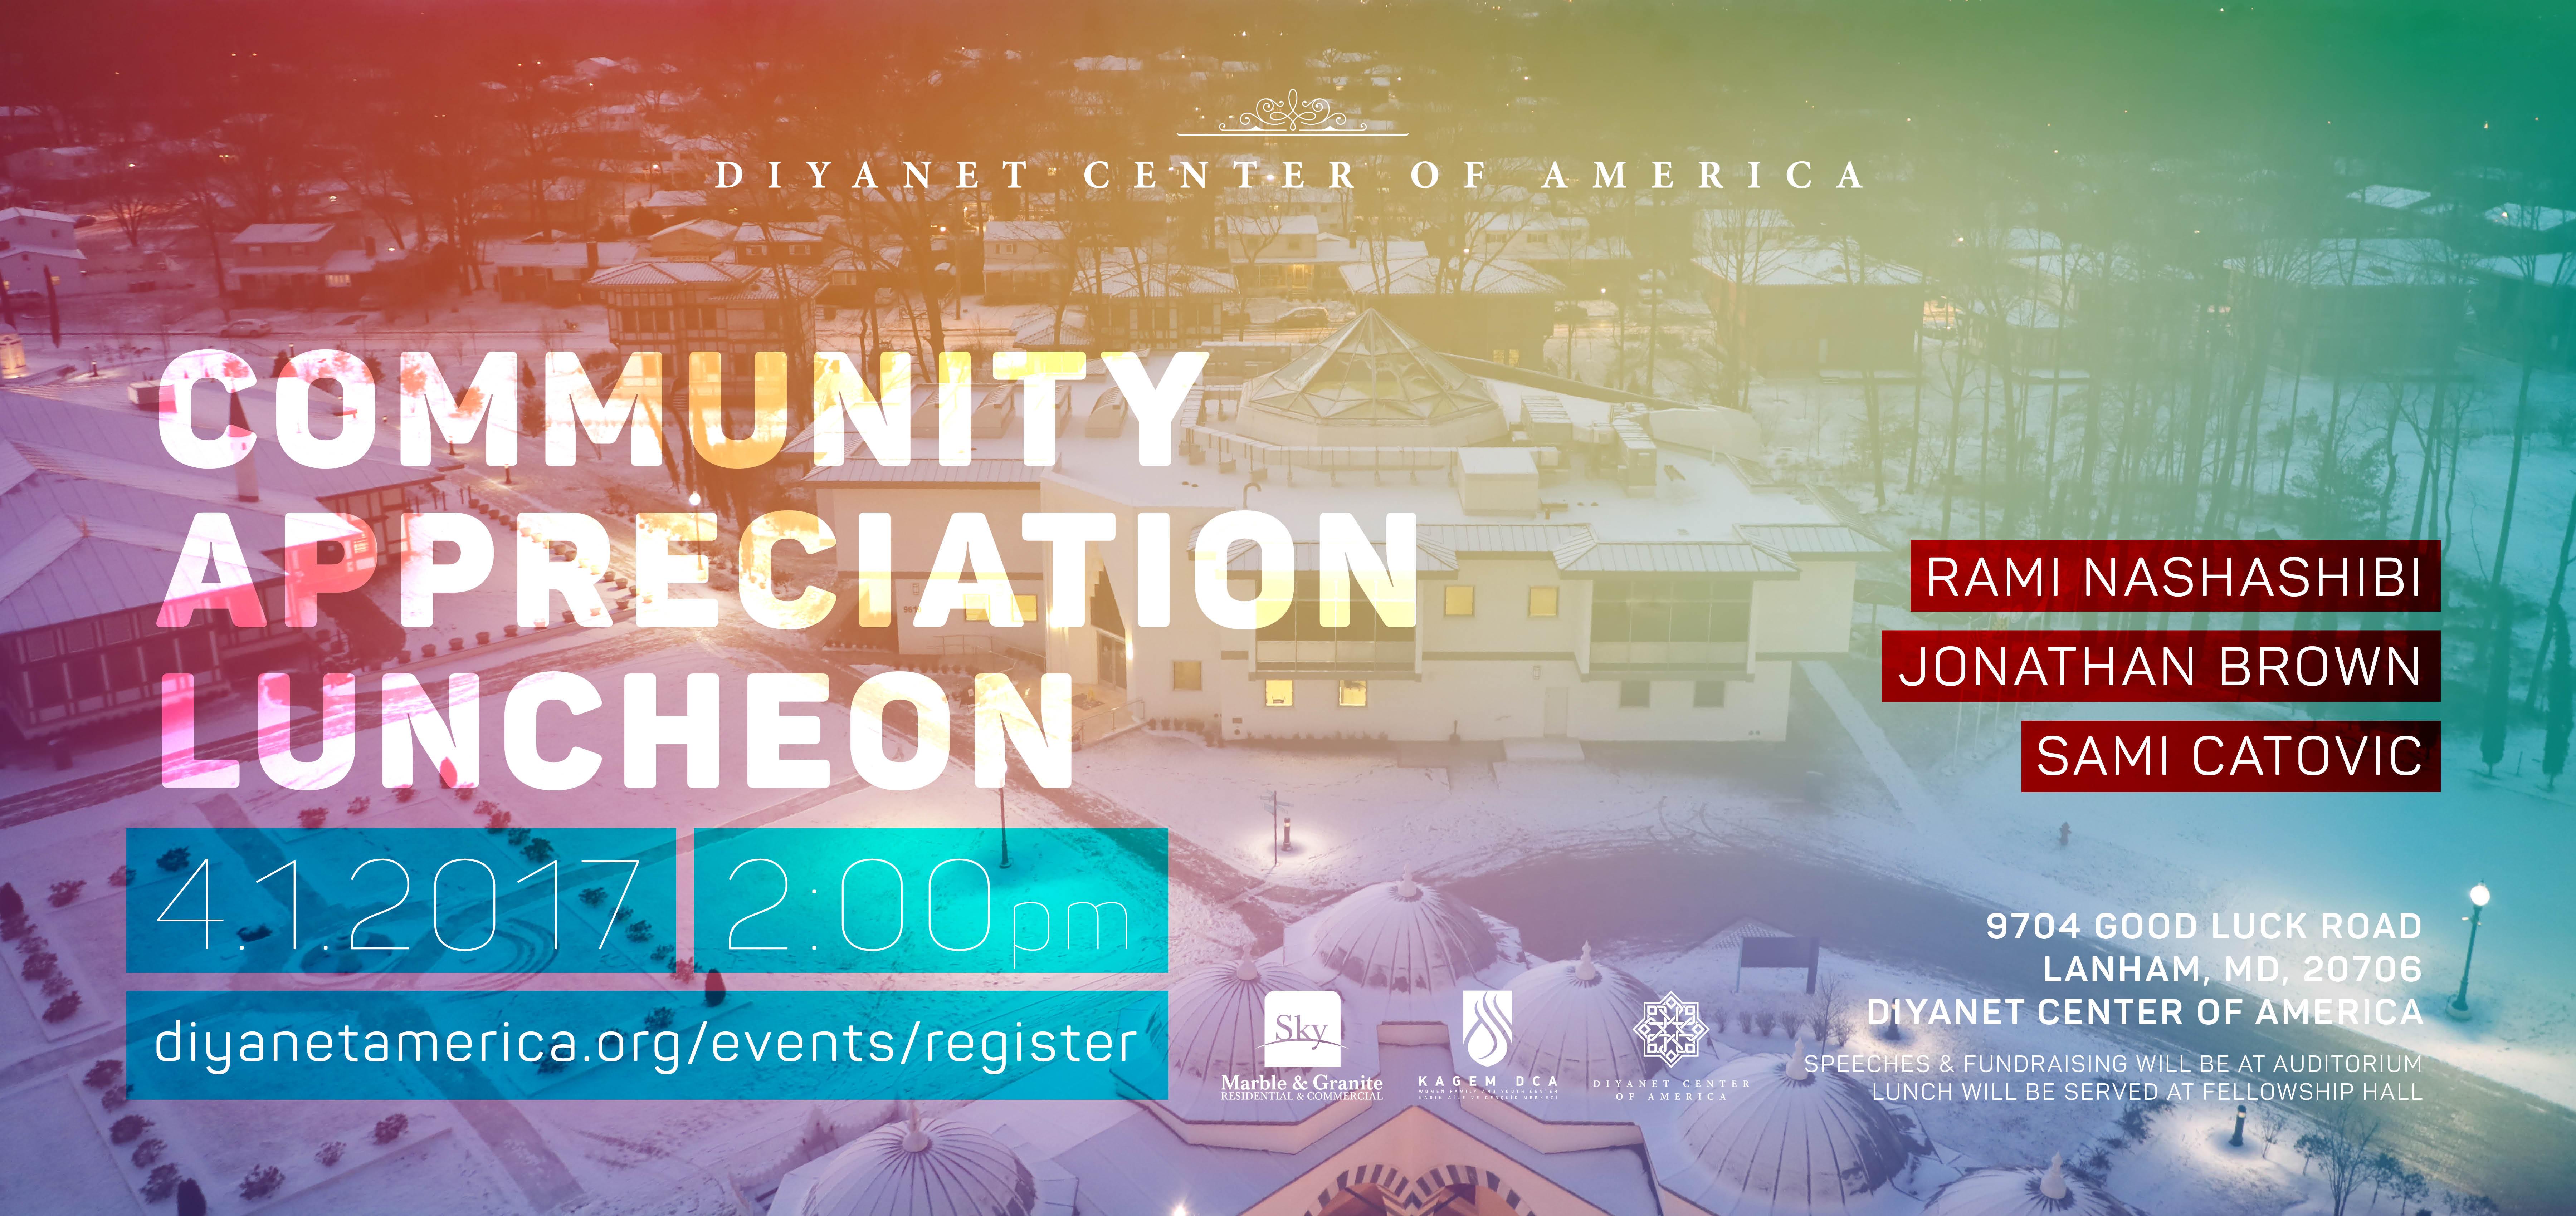 Annual Community Appreciation Luncheon